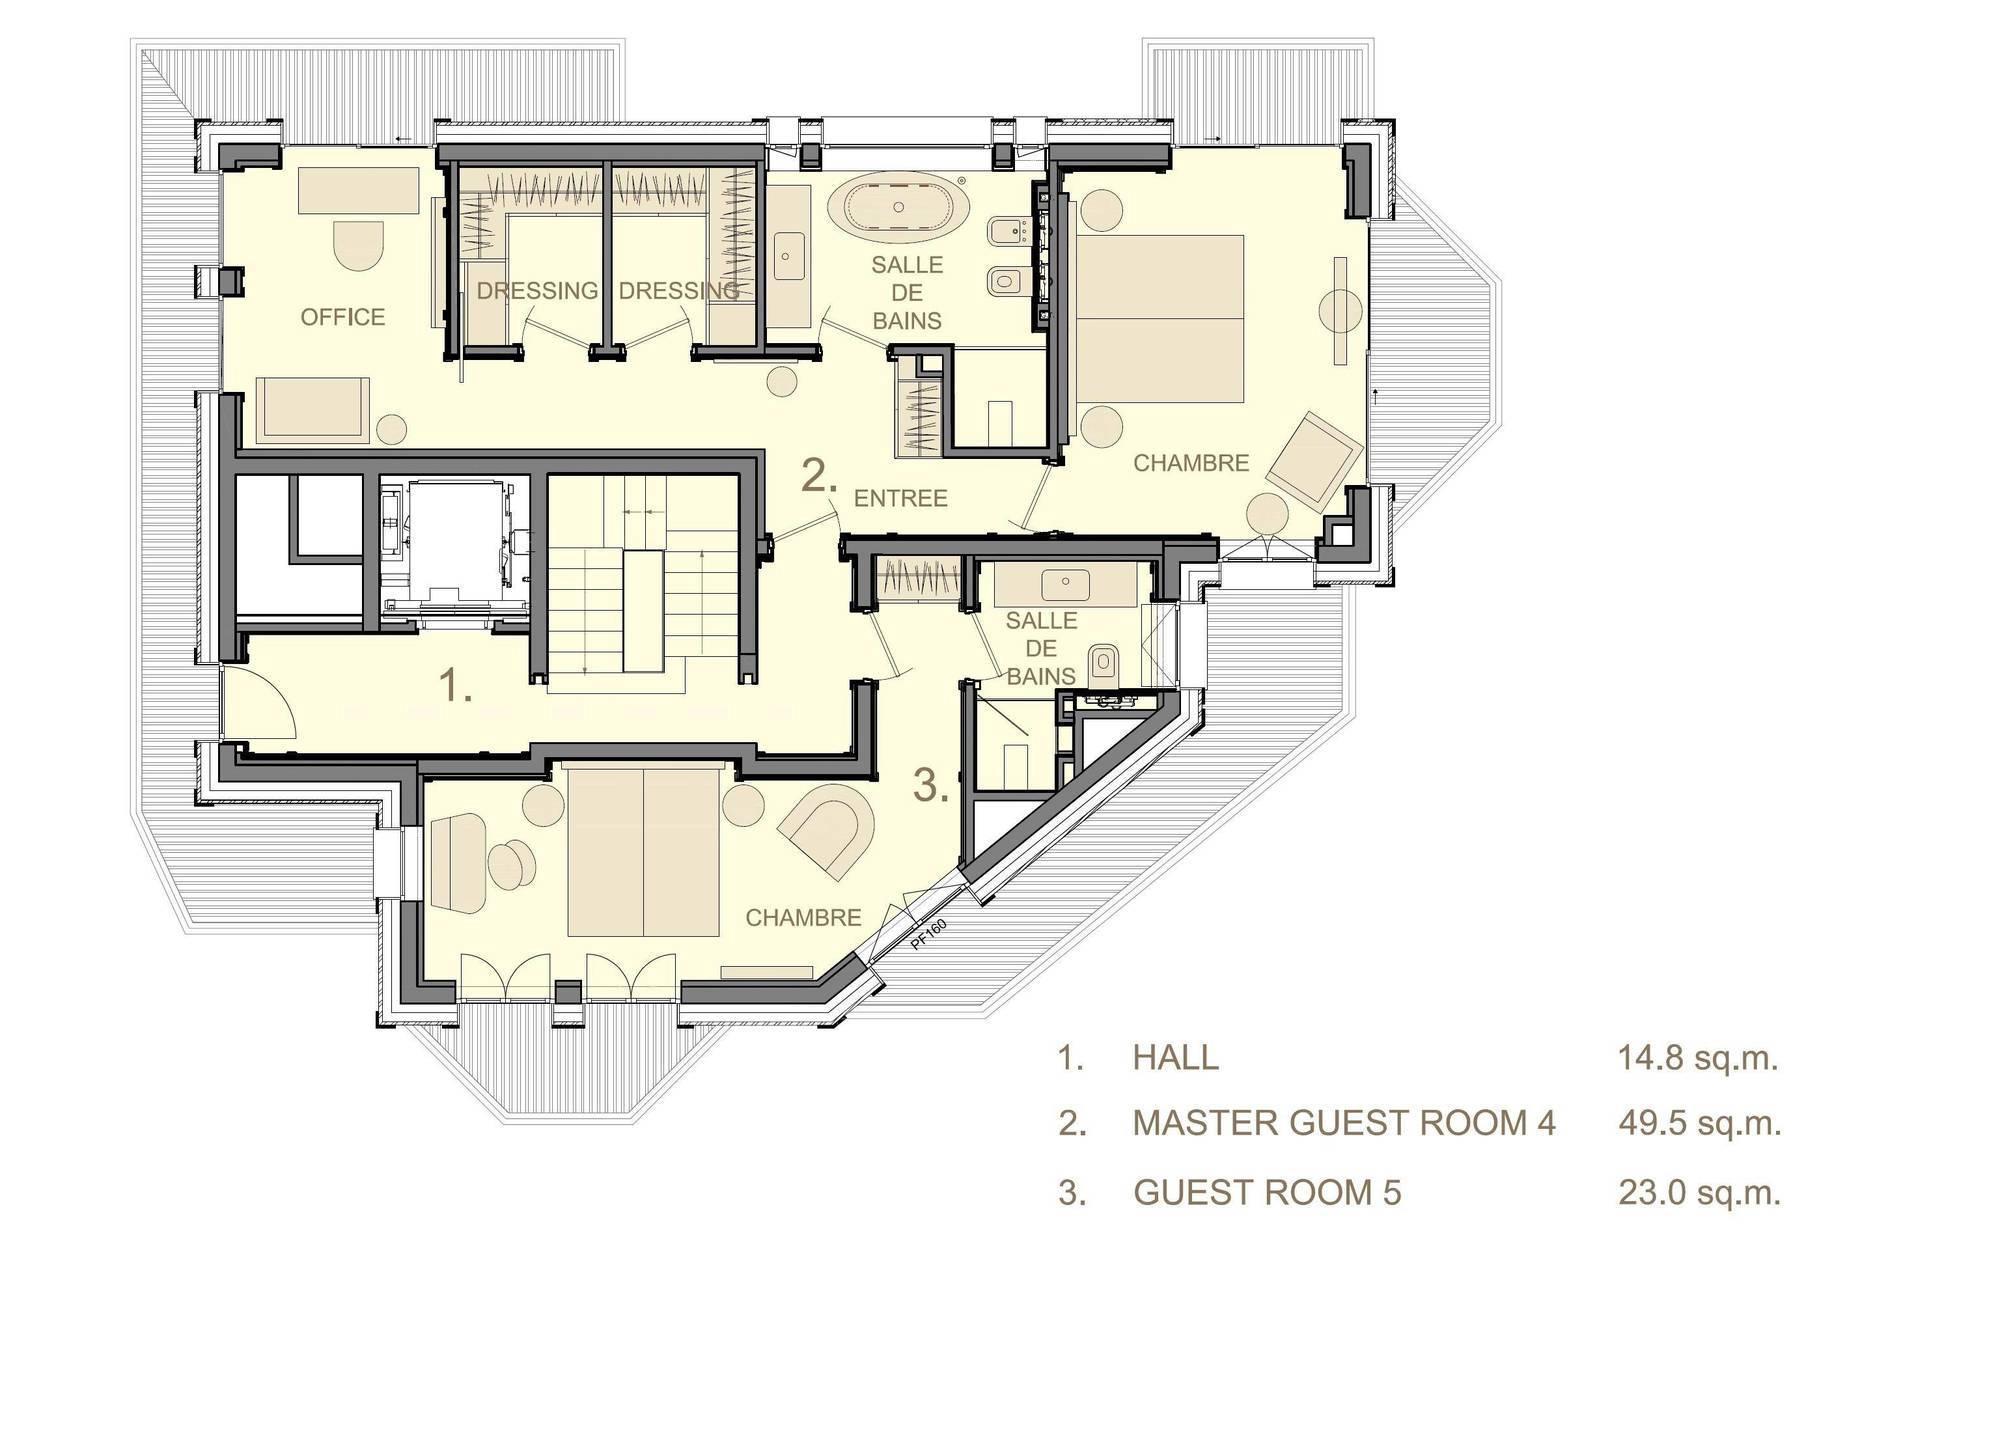 Chalet La Datcha Courchevel Floor Plan 1